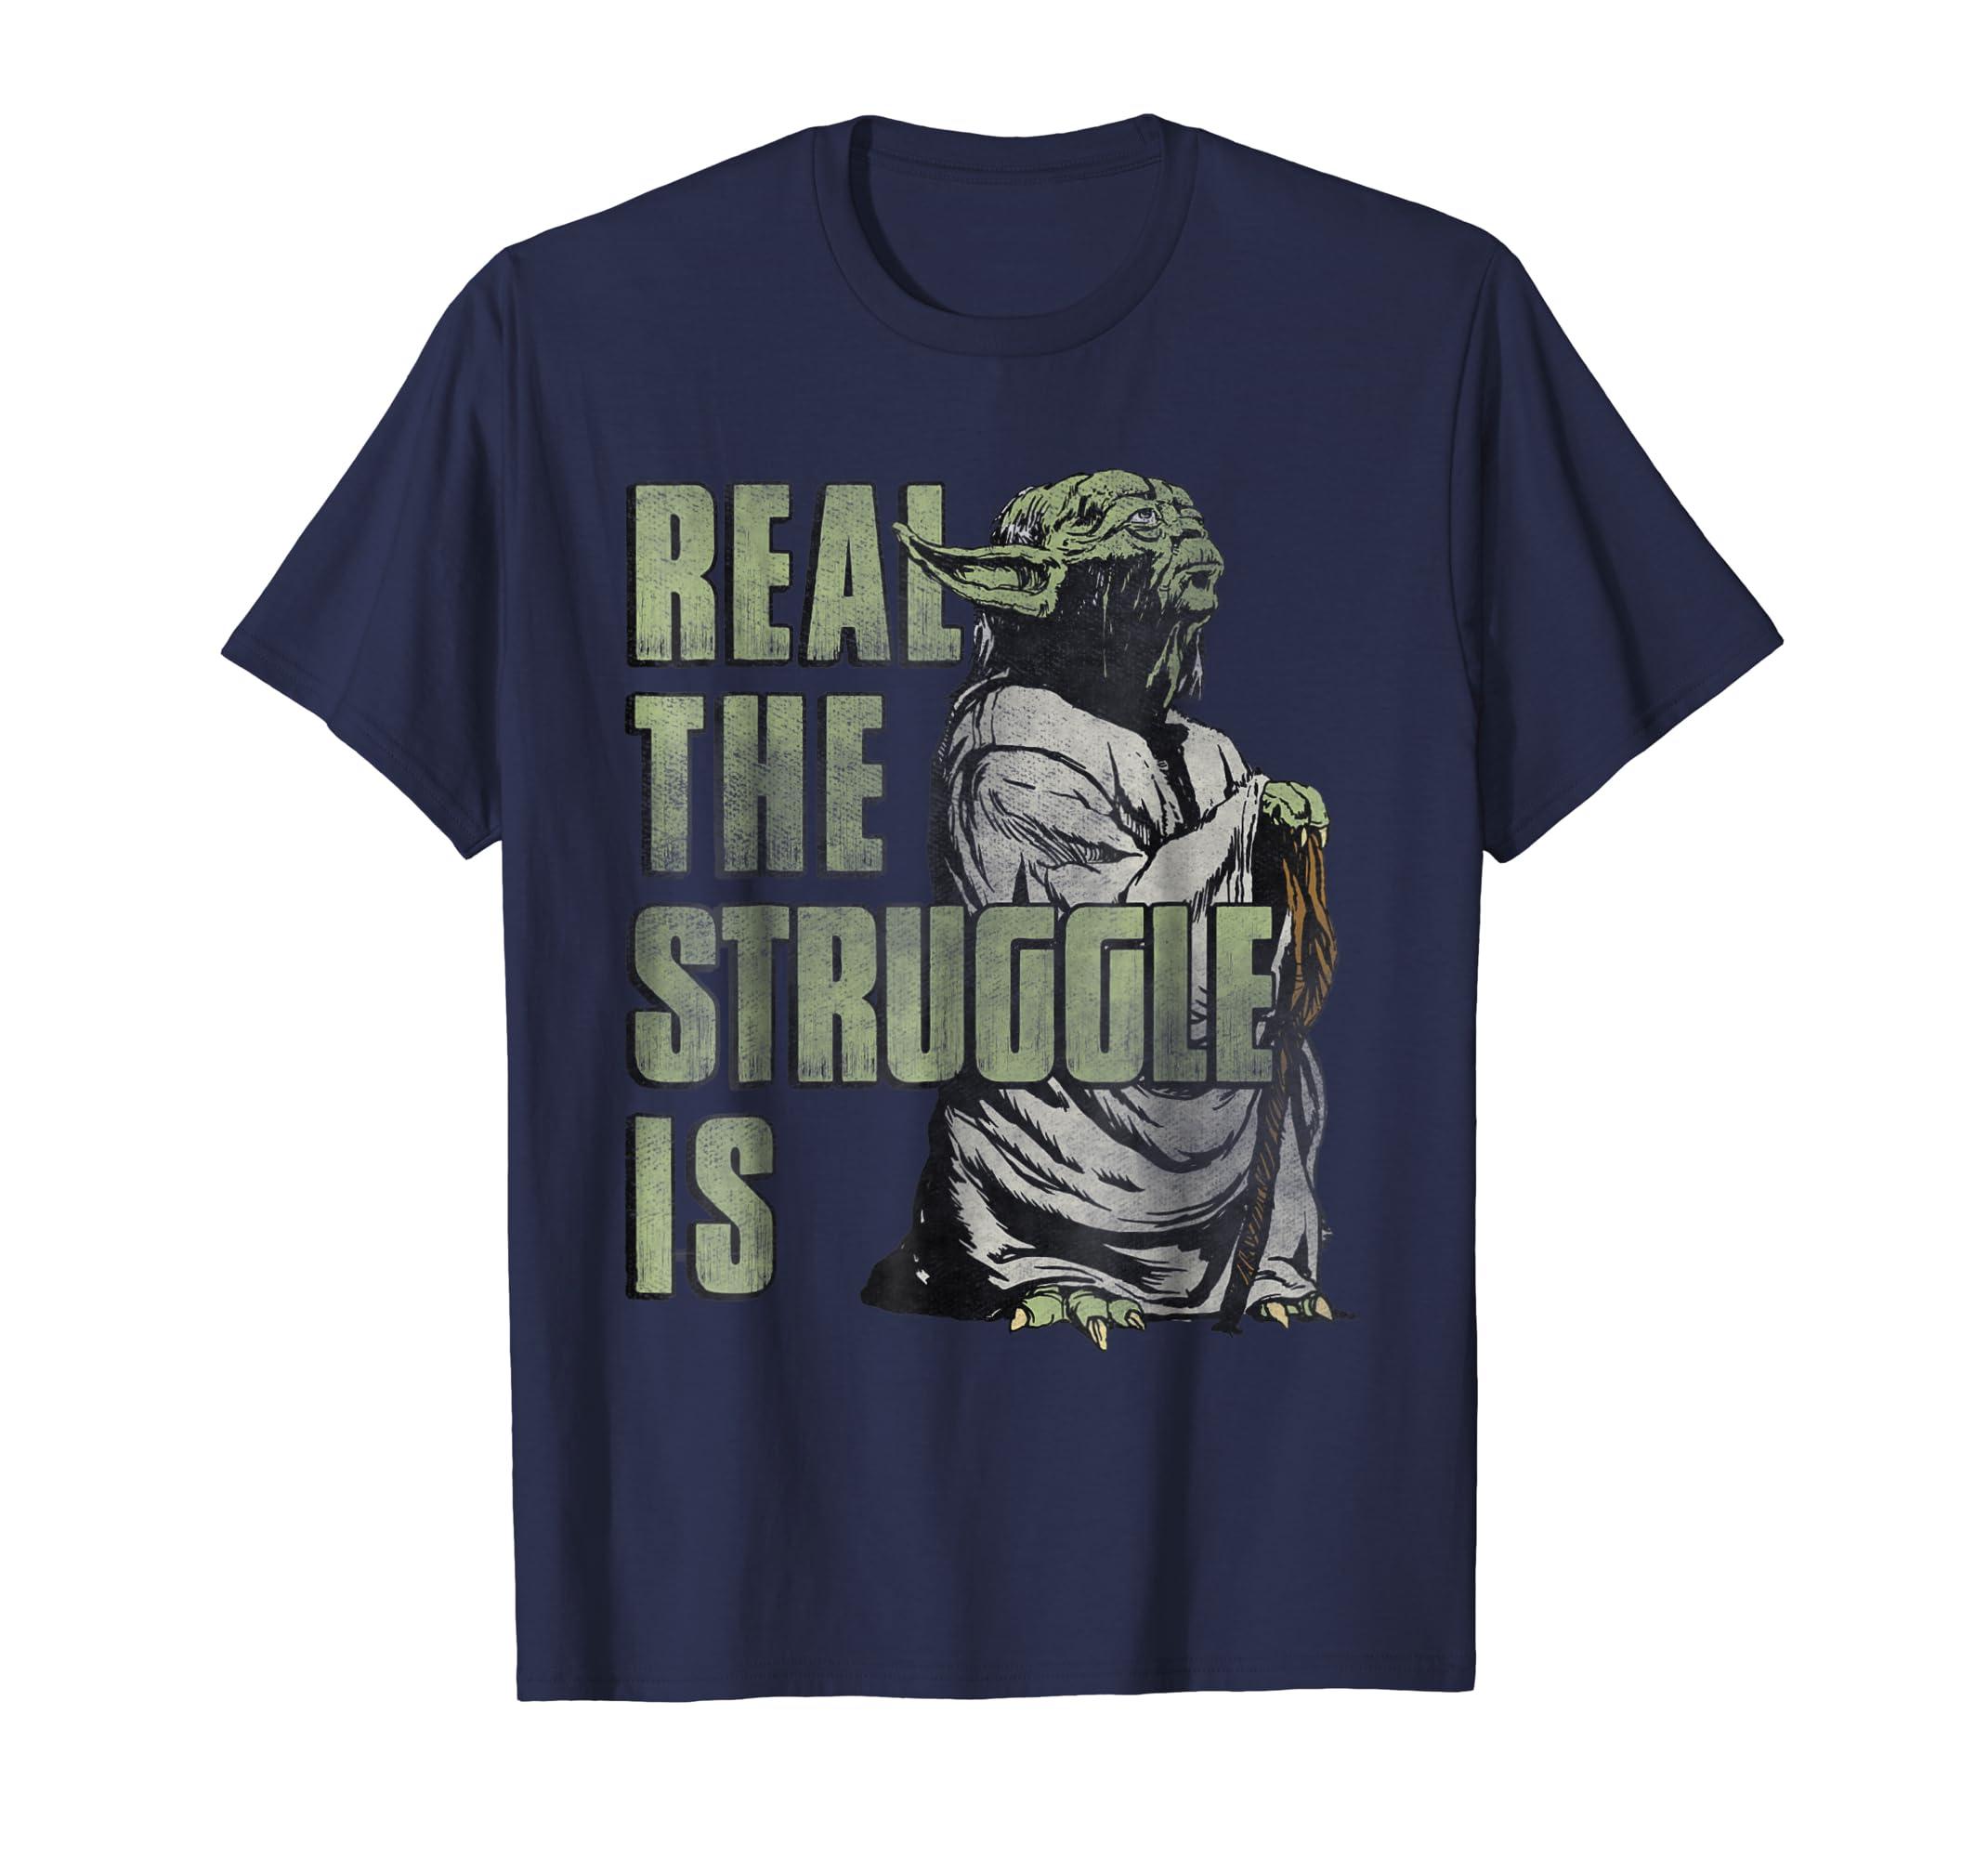 43fa7568 Amazon.com: Star Wars Yoda Real The Struggle Is Graphic T-Shirt: Clothing